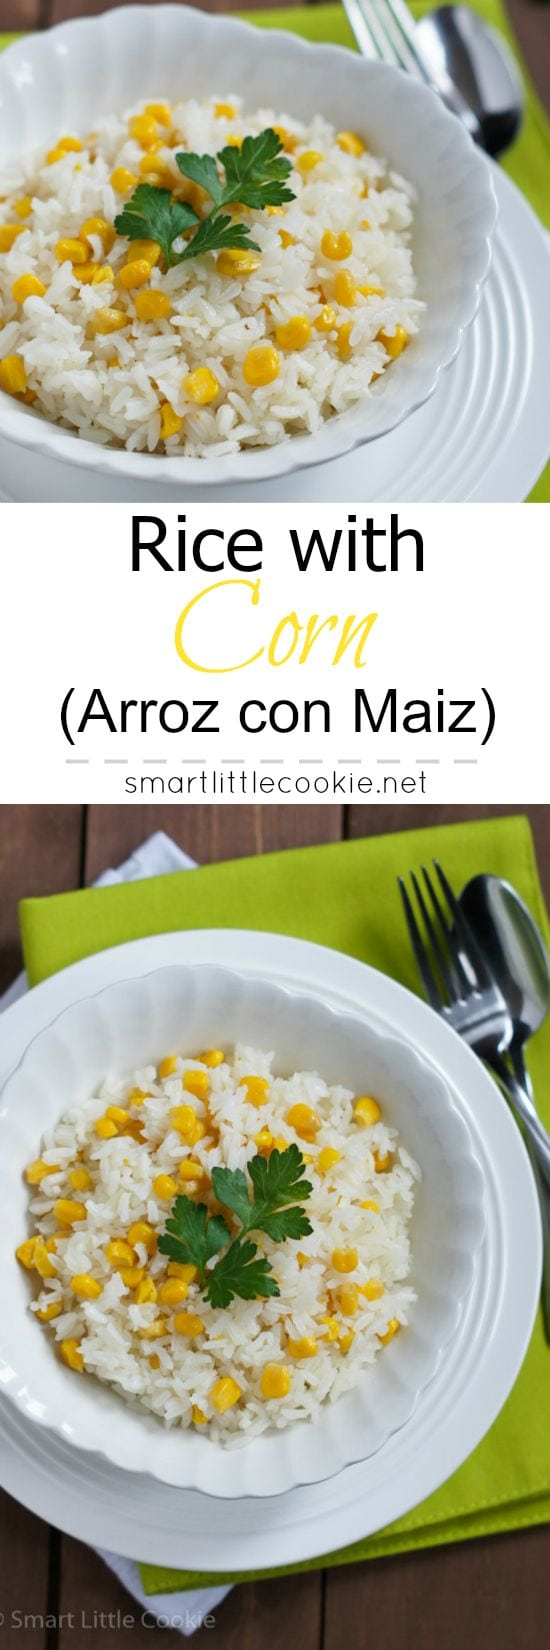 Rice with Corn (Arroz con Maiz) | smartlittlecookie.net